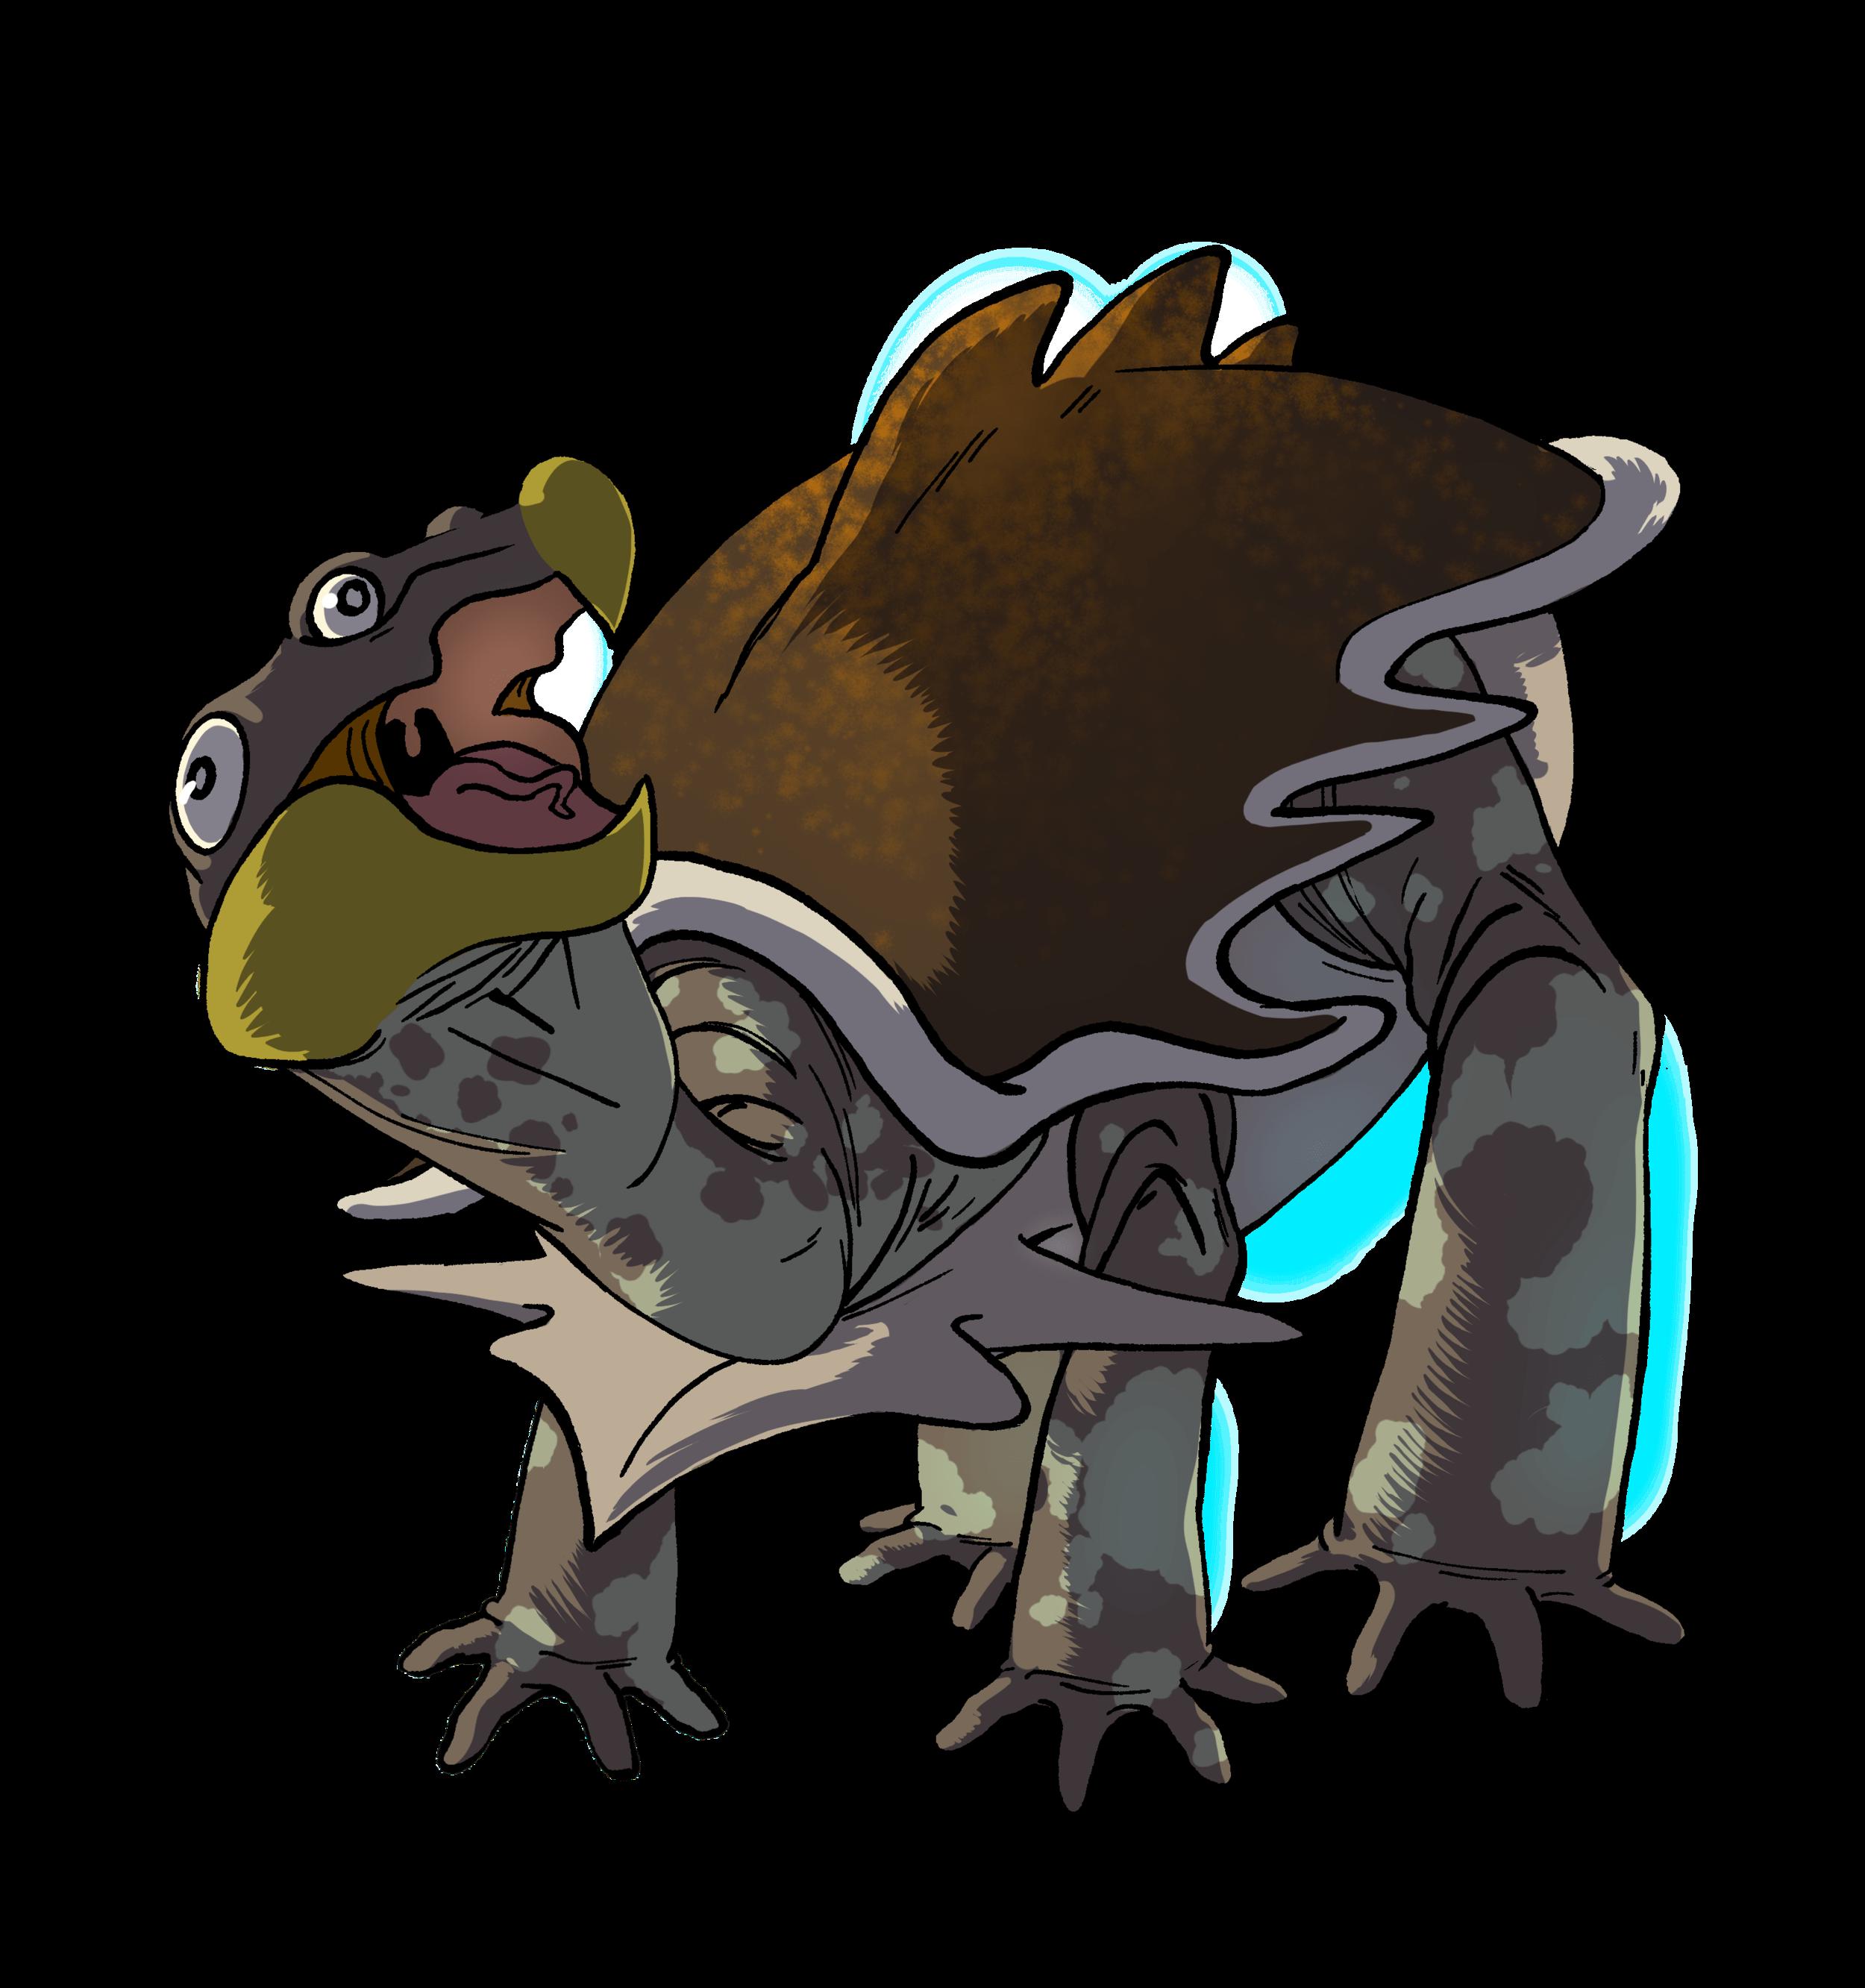 Kordata Turtle | Illustration by Casey Cookson